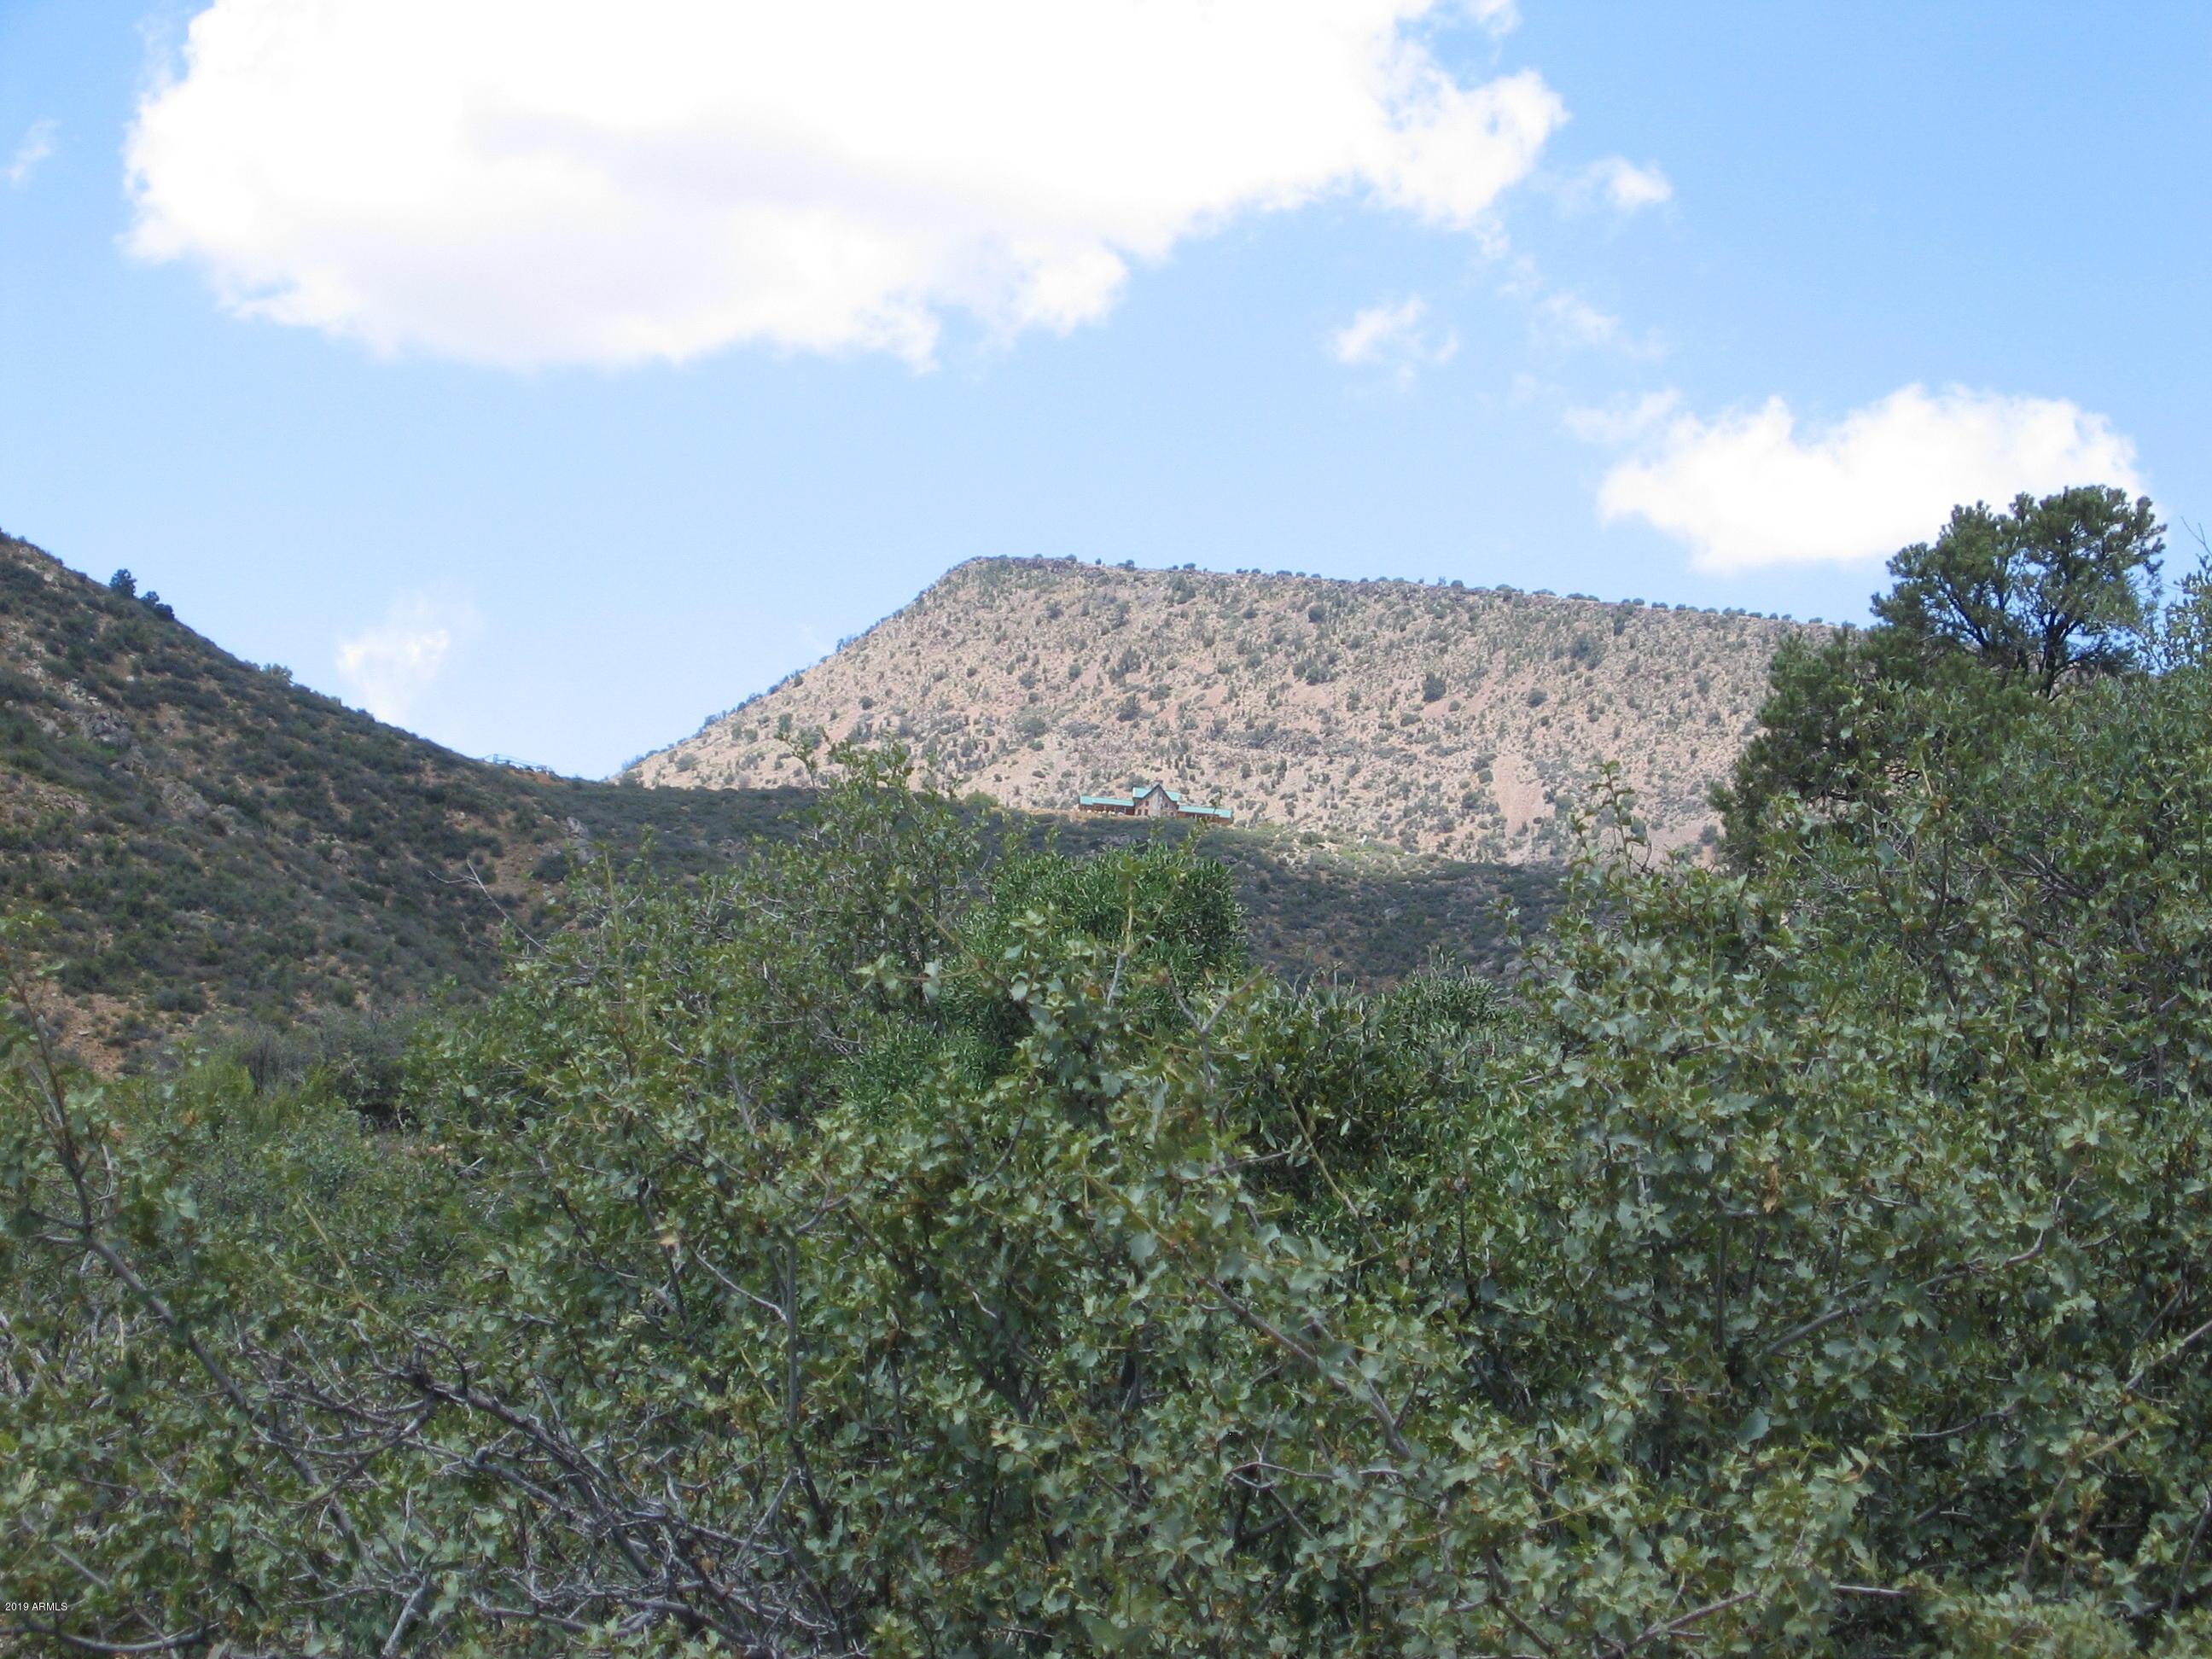 Lot 2 Unit 1-K Fort Rock Ranches --